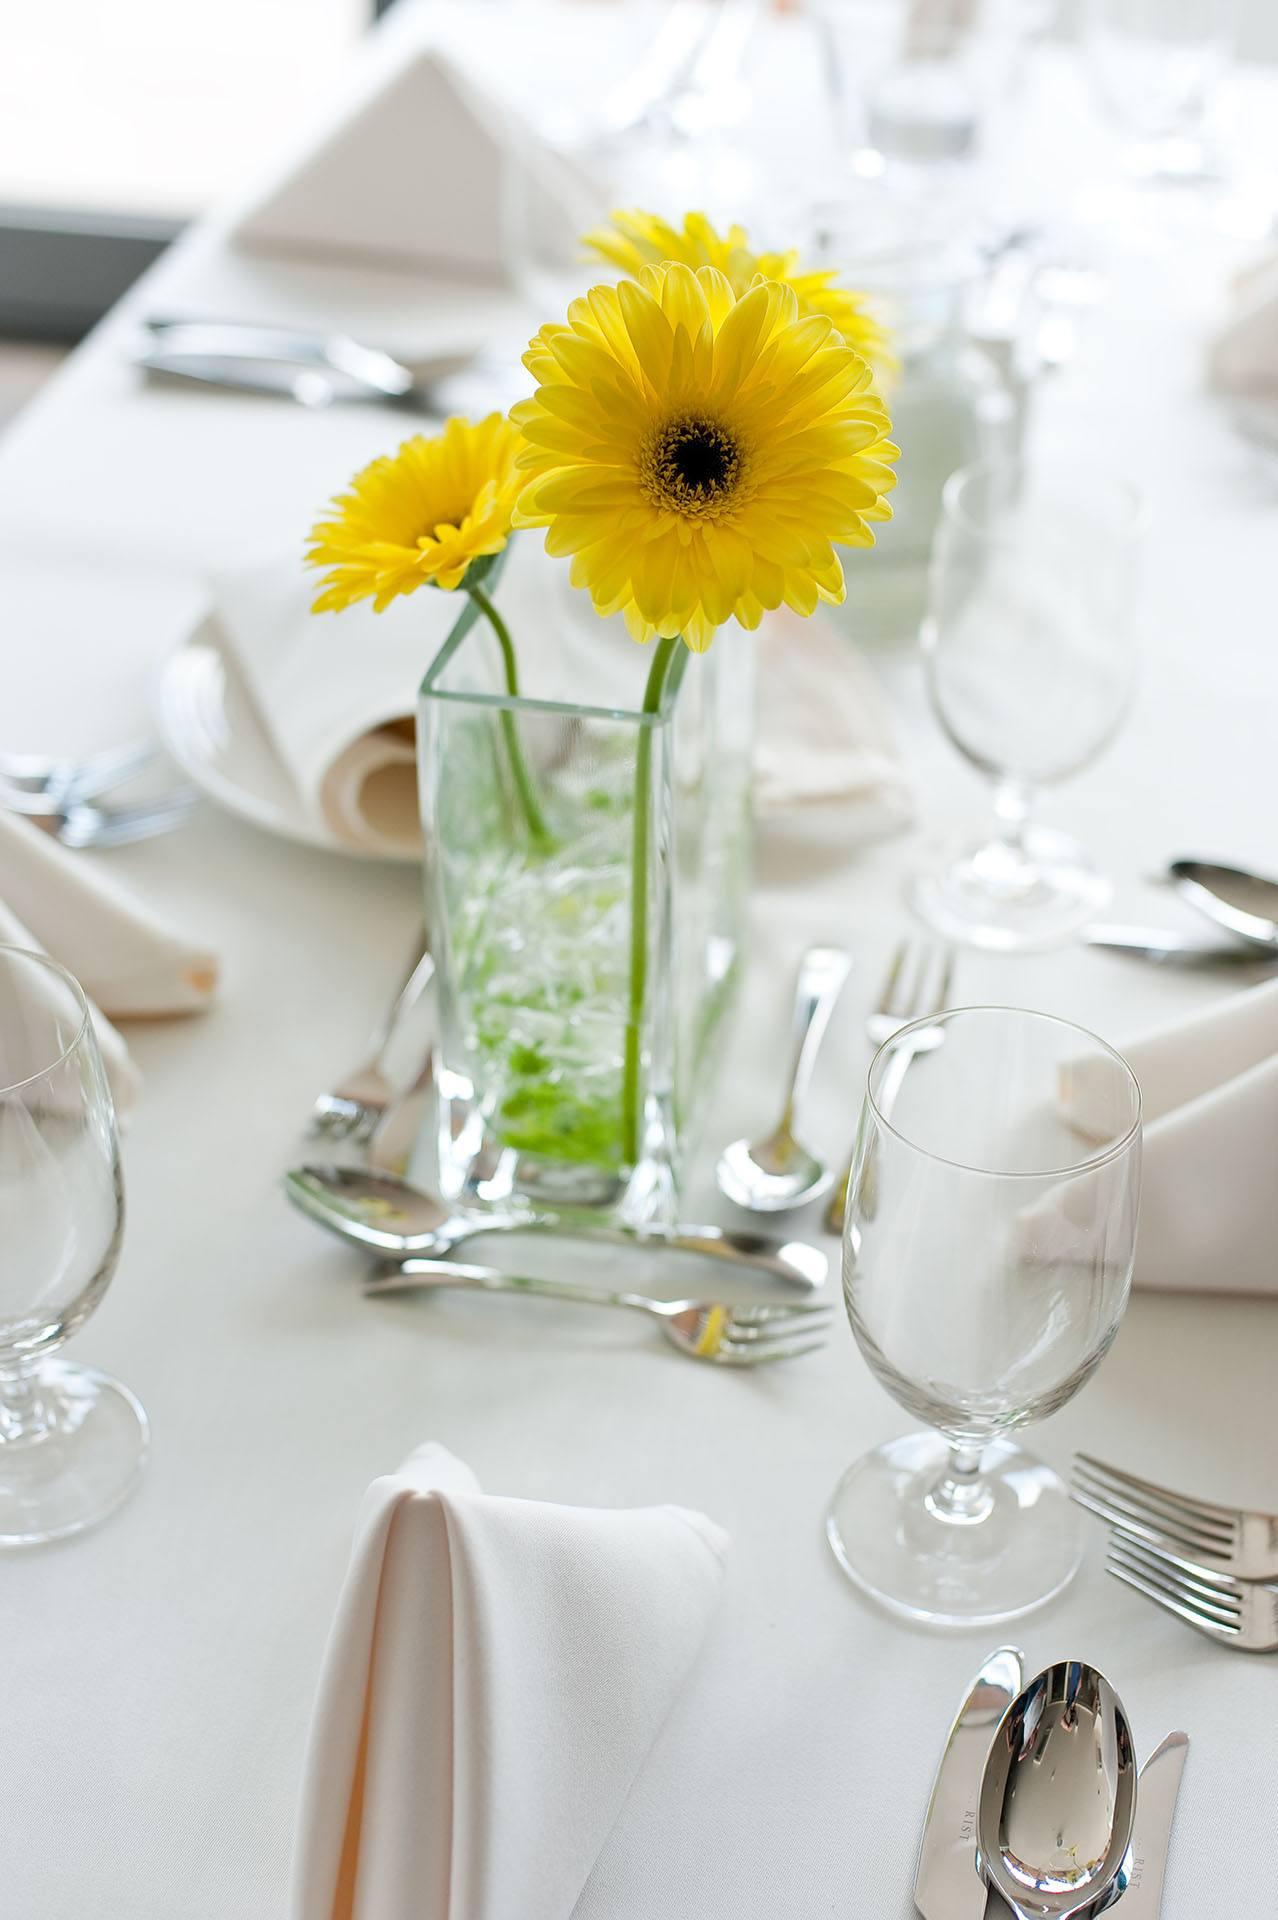 Žluté gerbery jako dekorace svatební tabule